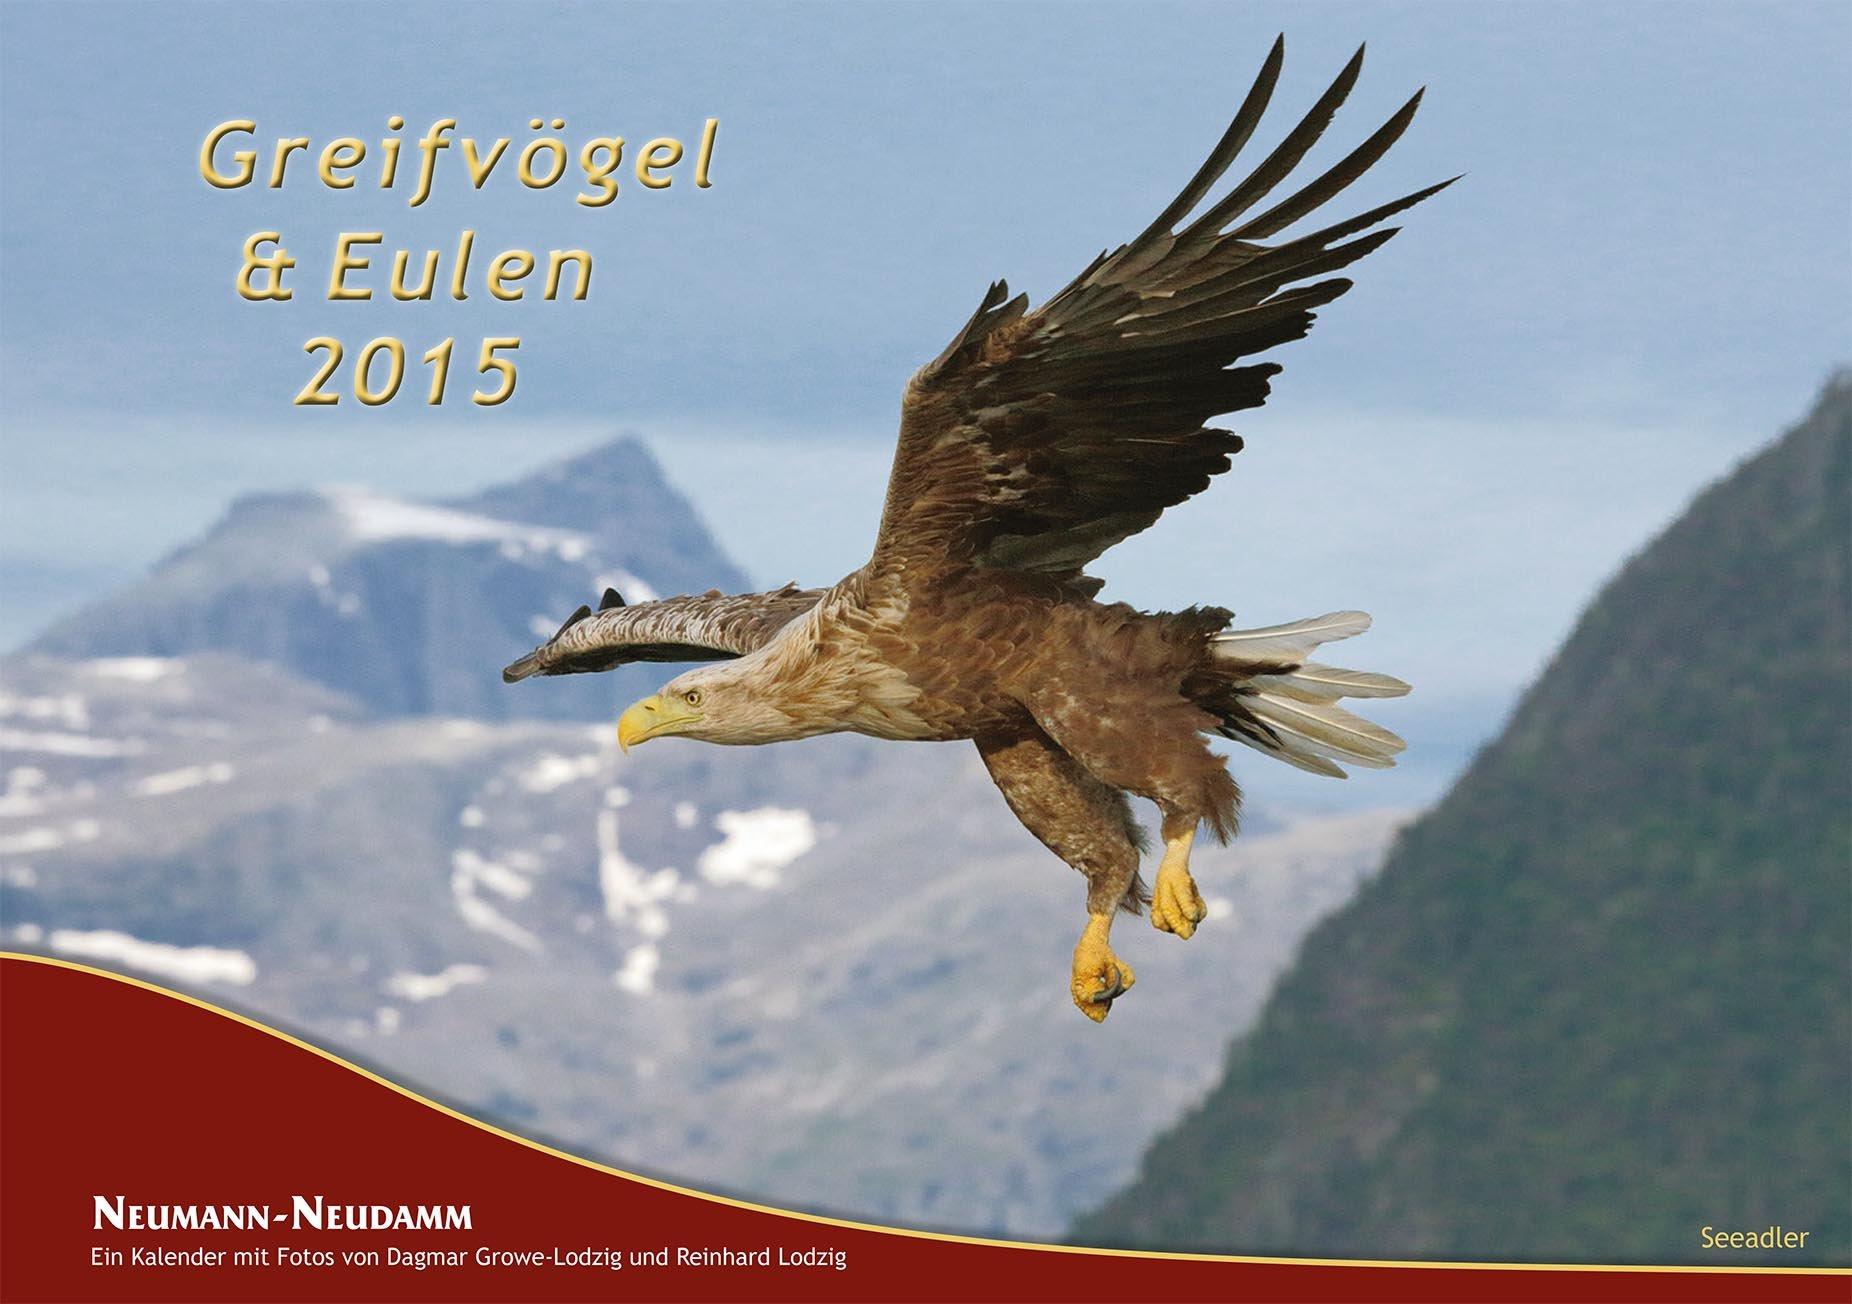 Greifvögel & Eulen 2015